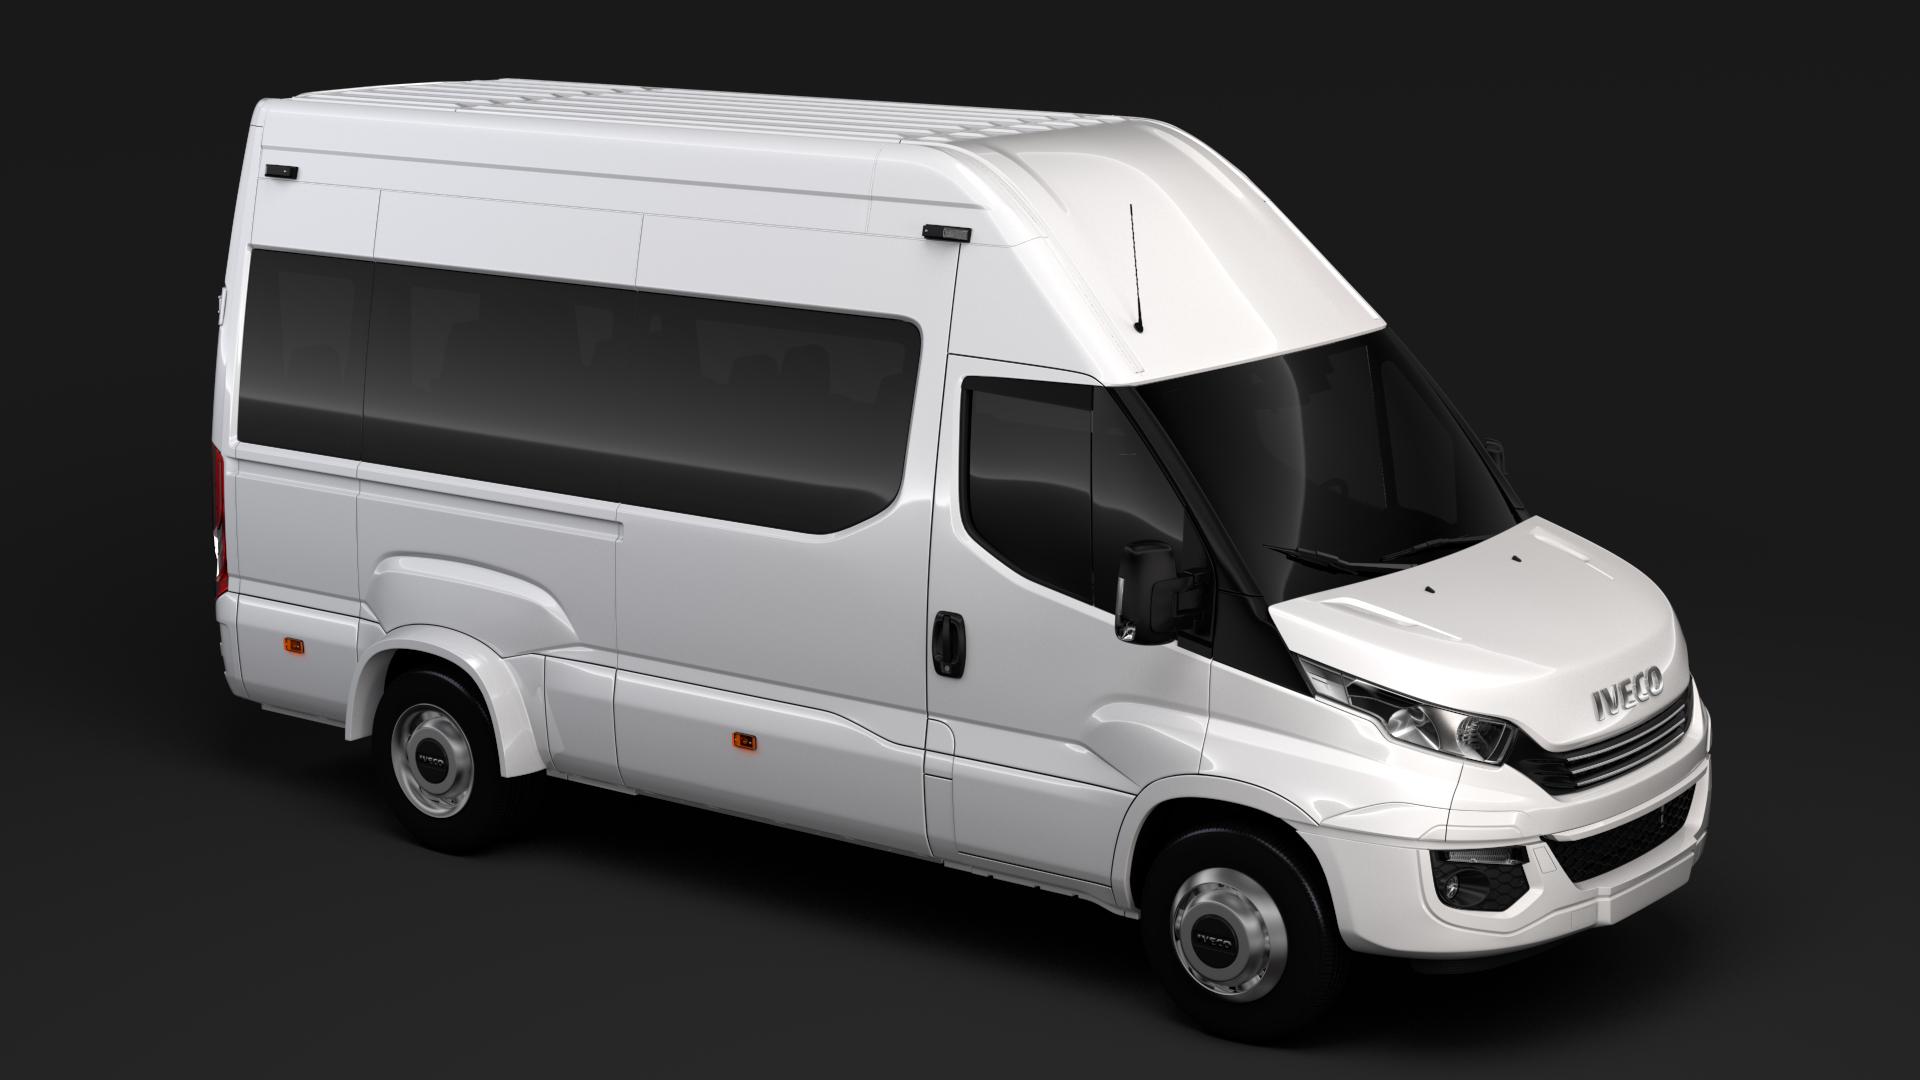 iveco daily minibus l3h3 2017 3d model max fbx c4d lwo ma mb hrc xsi obj 276151